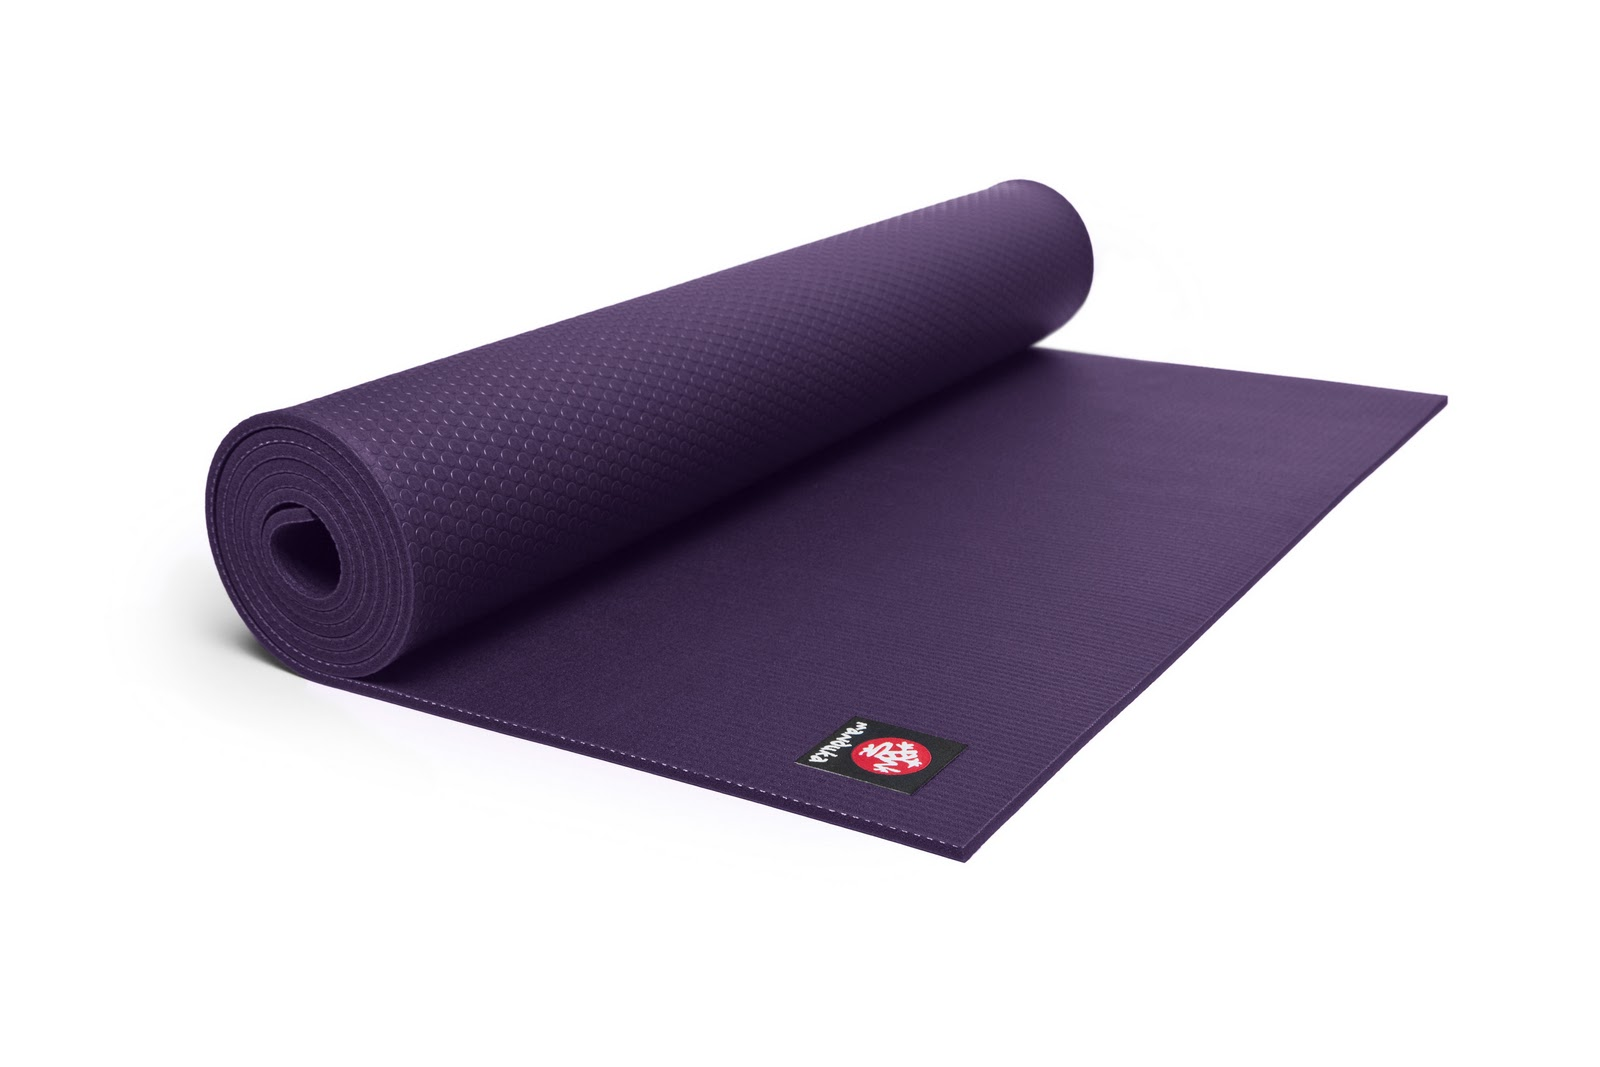 Com Thinking Of Prenatal Yoga Manduka Yoga Mats Are On SALE